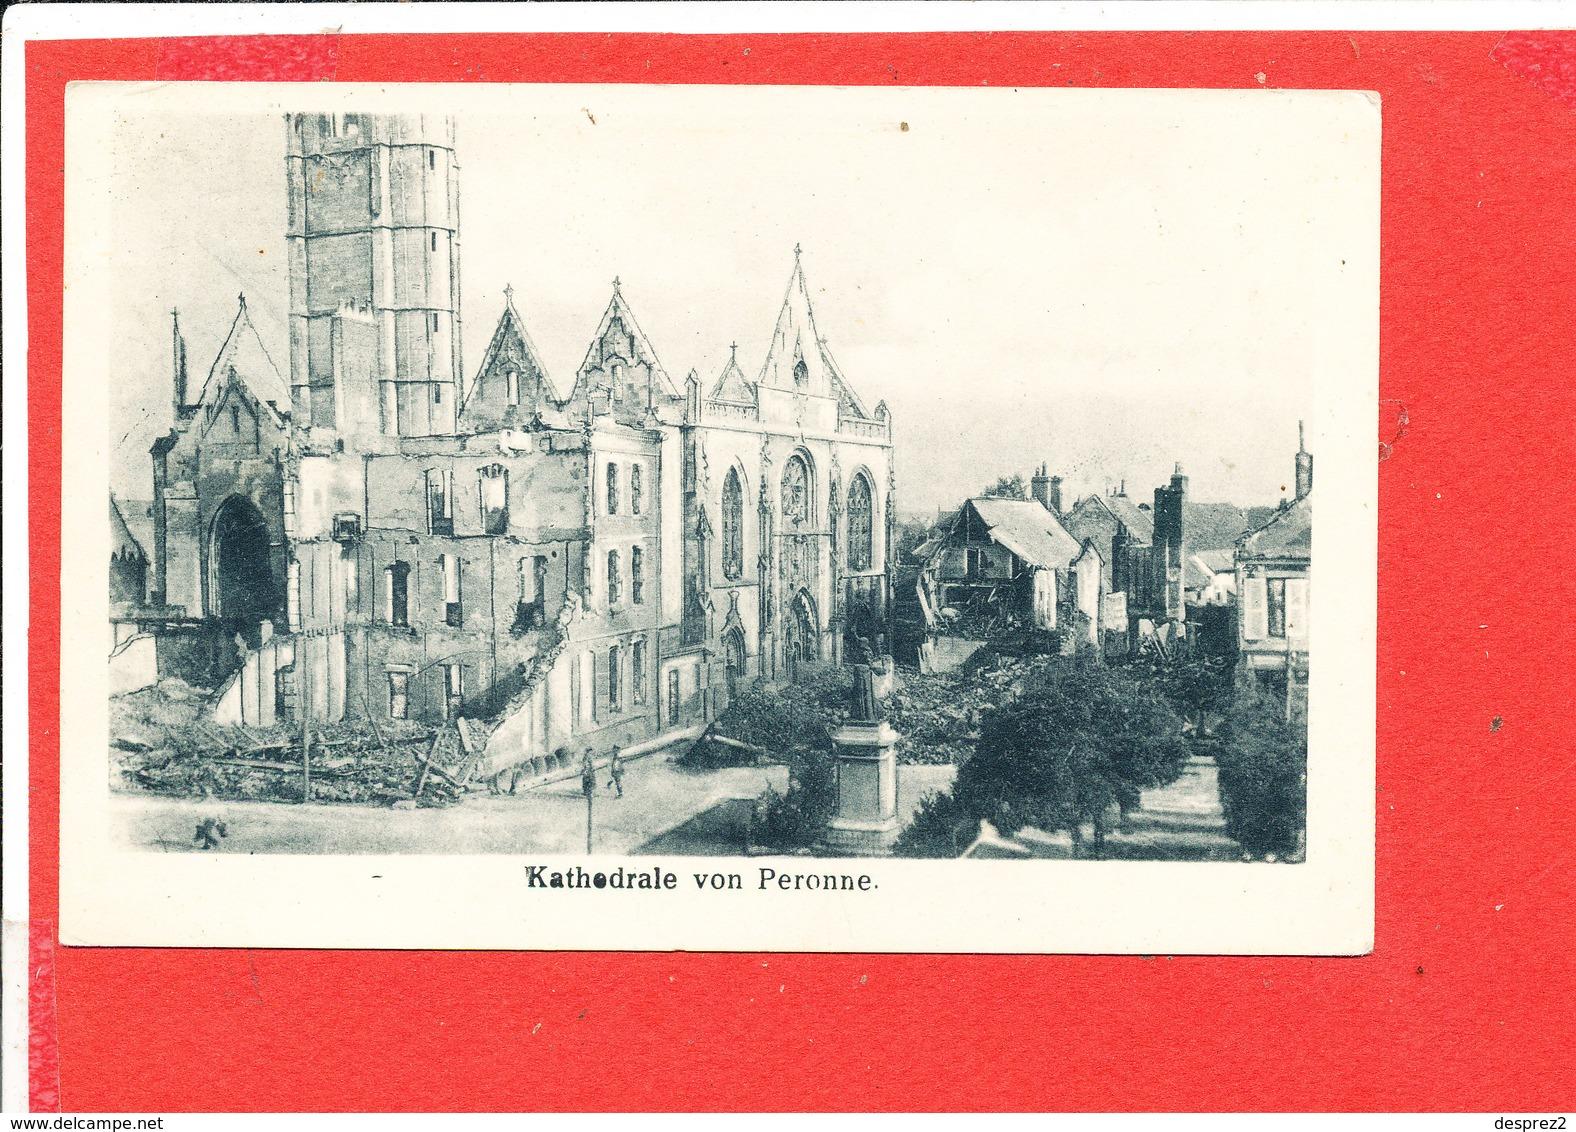 80 PERONNE Cpa Allemande Katedrale 724 Verlag K B - Peronne